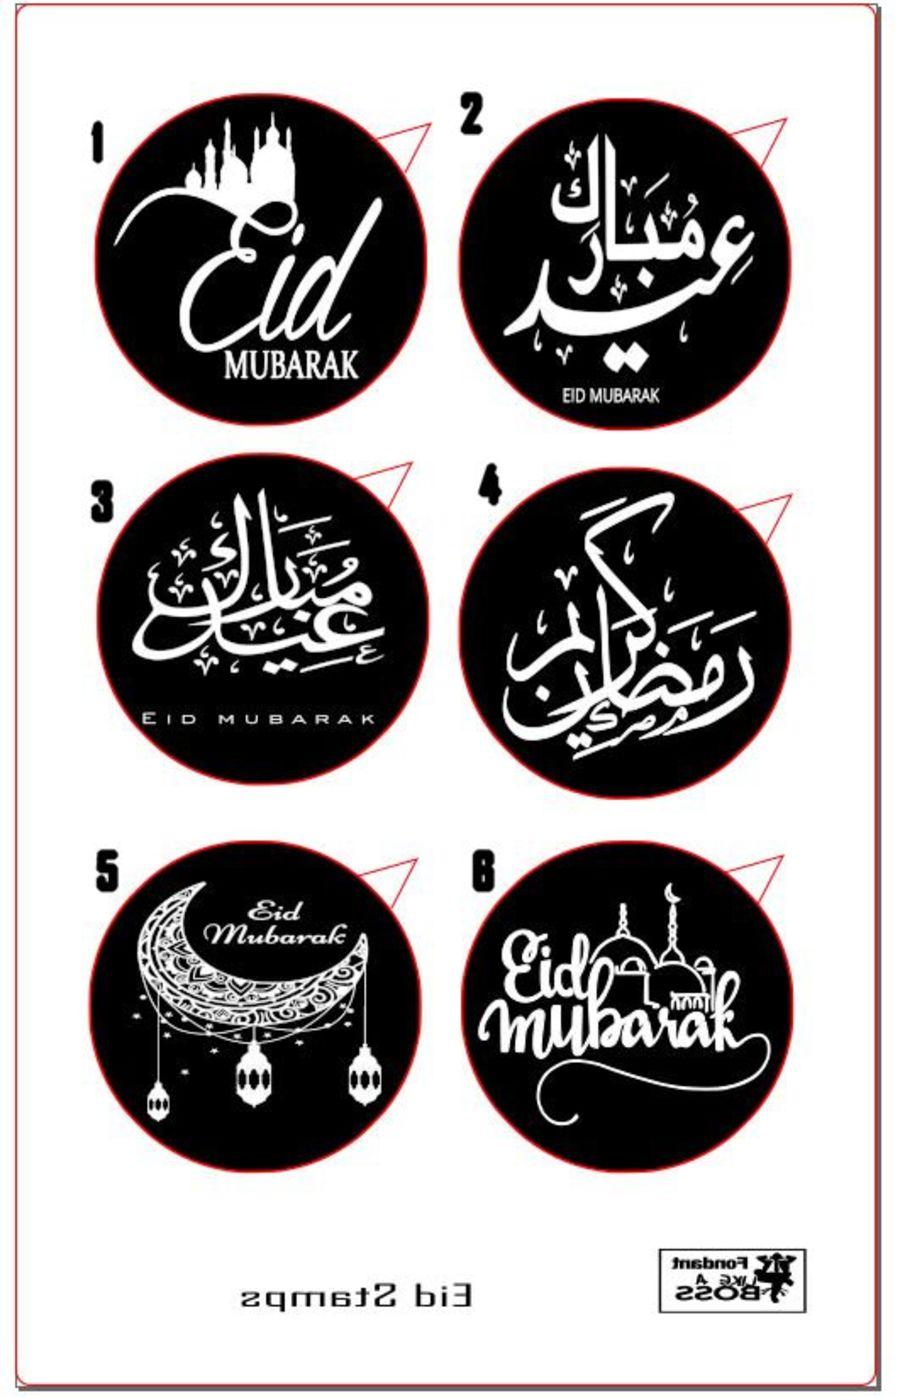 2 inch round stamps, Eid Mubarak fondant boss stamps